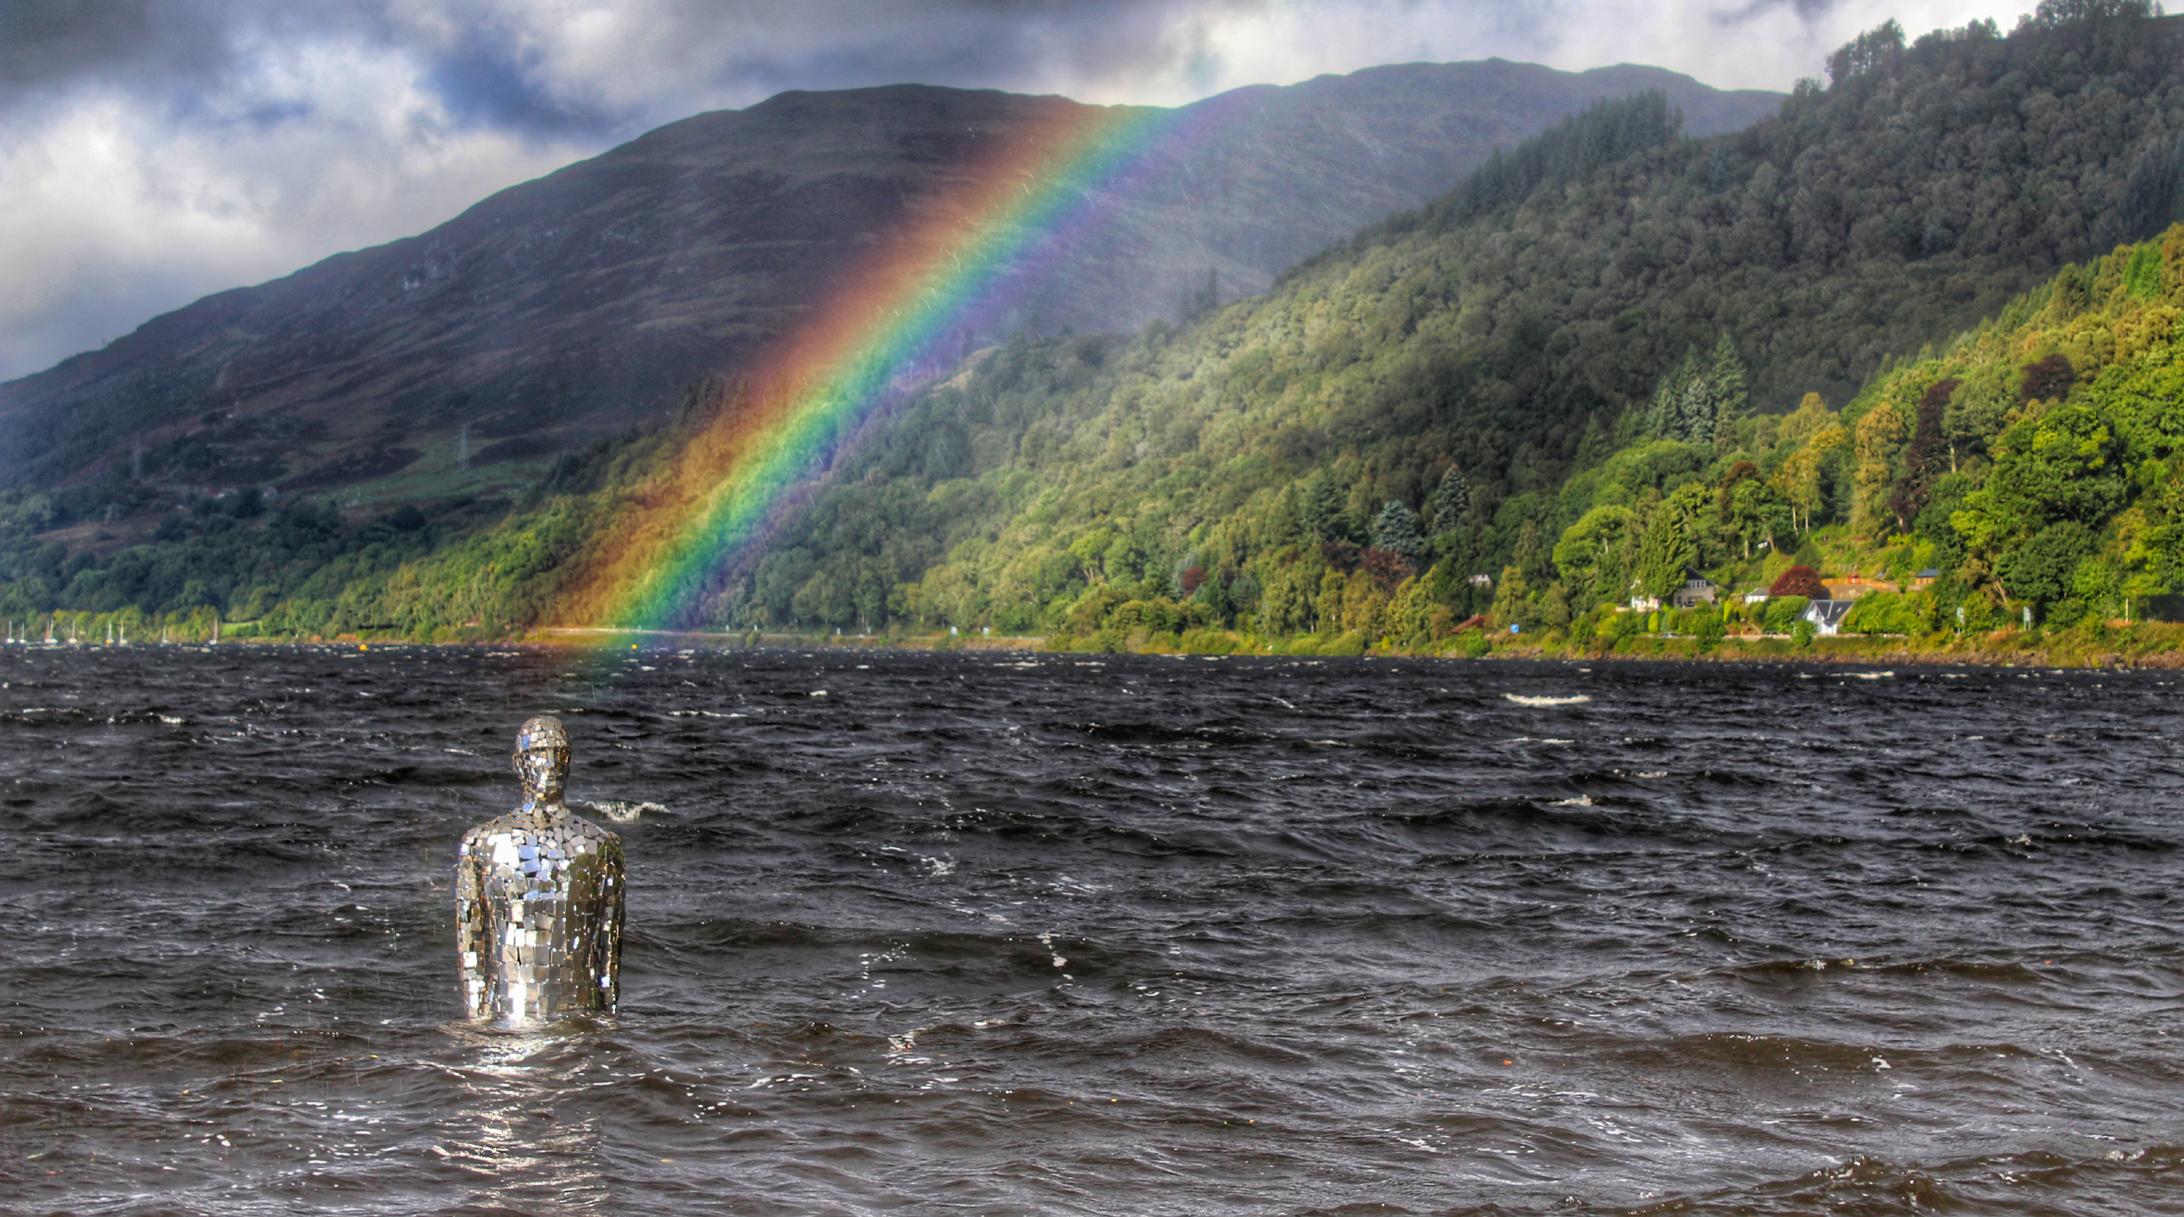 Mirror man with rainbow